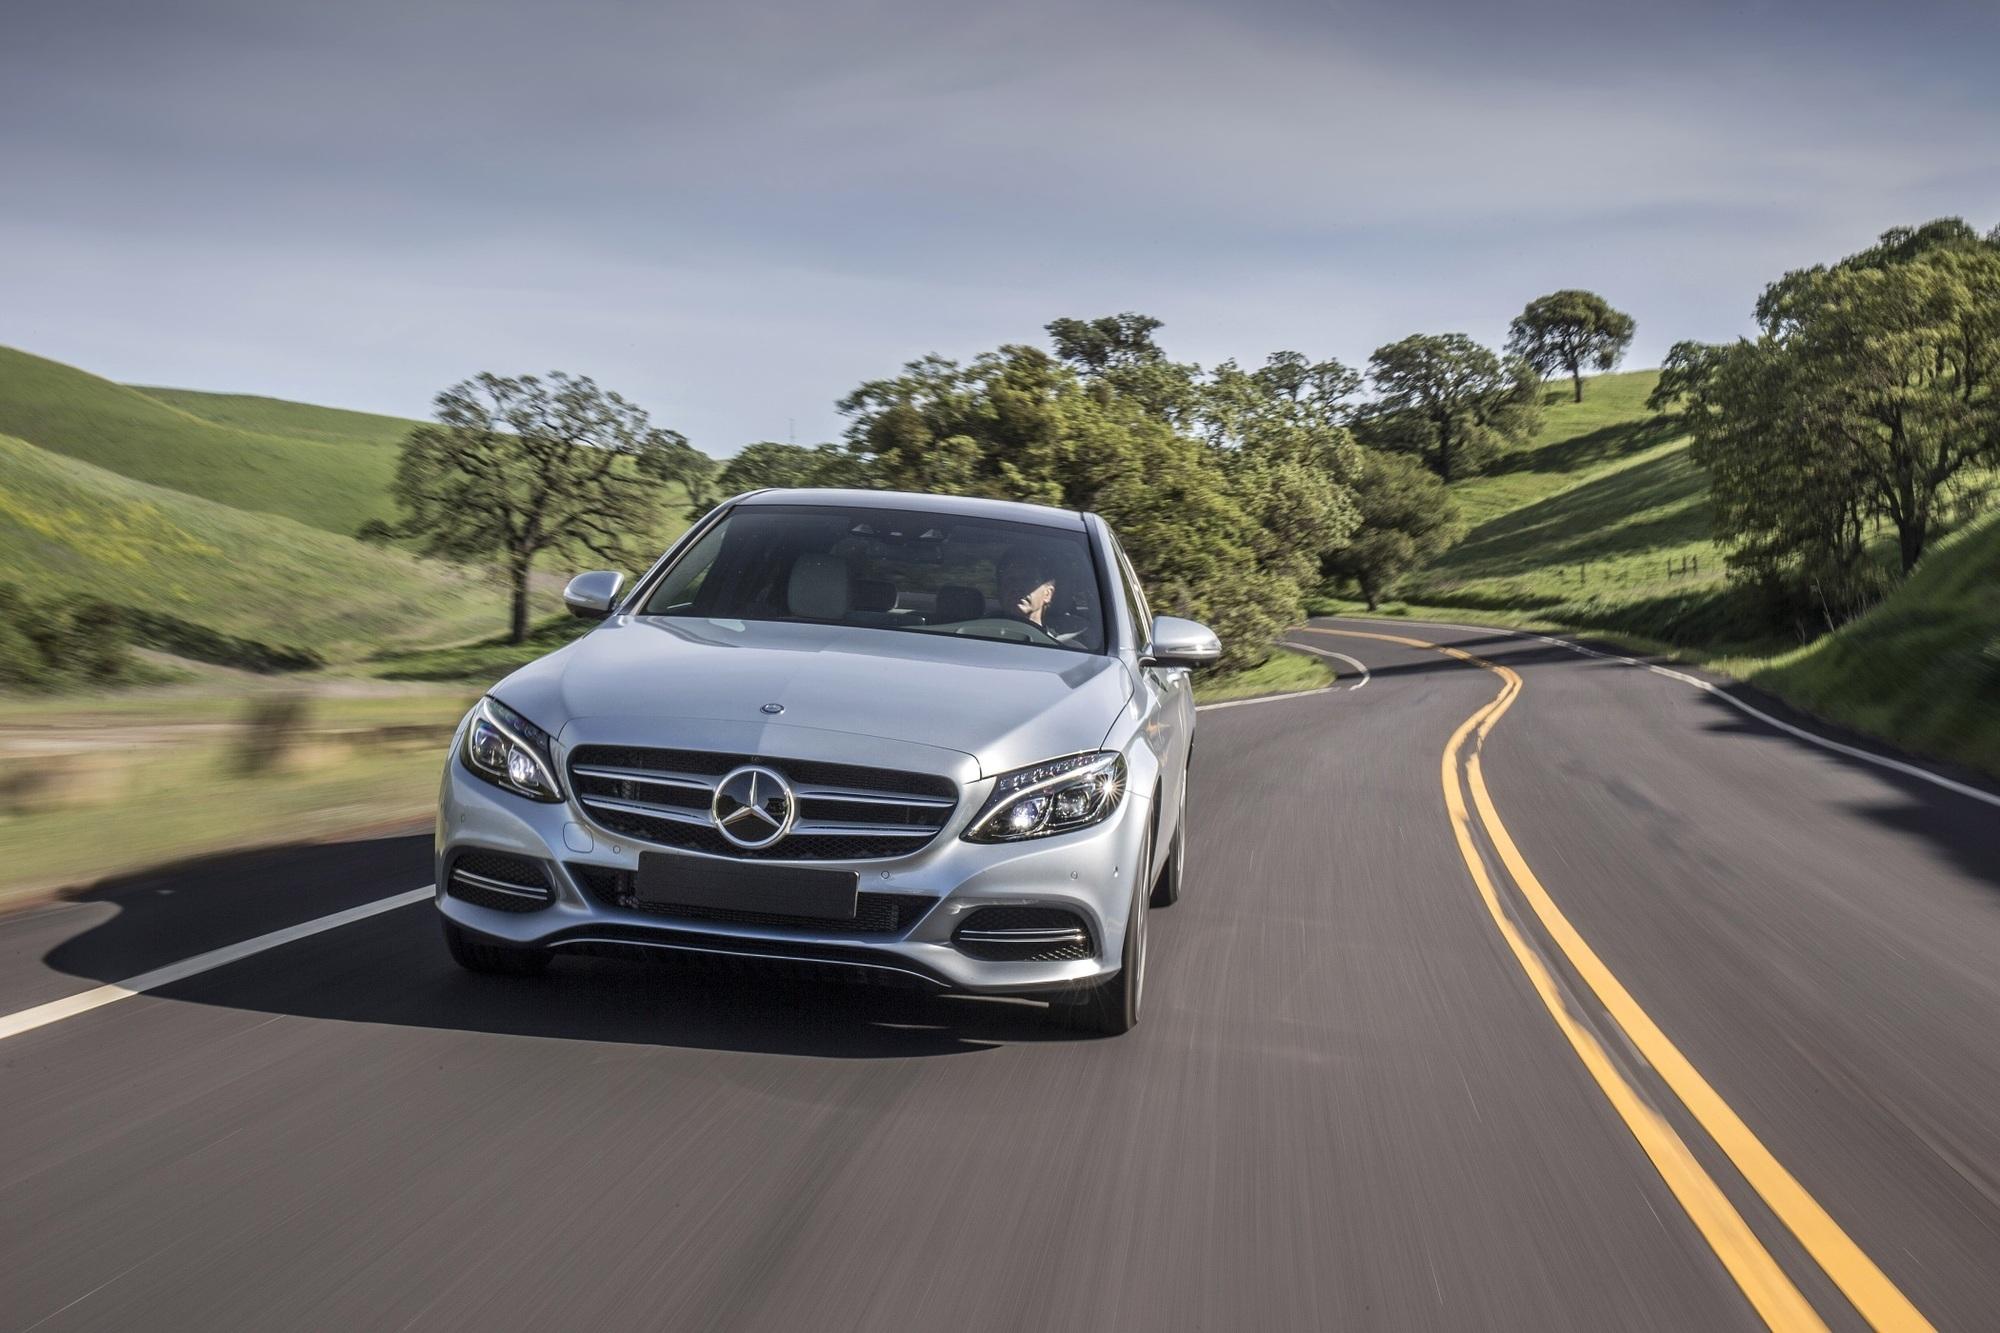 Fahrbericht: Mercedes C 350e mit Plug-In-Hybrid  - C-Klasse mit hohem IQ